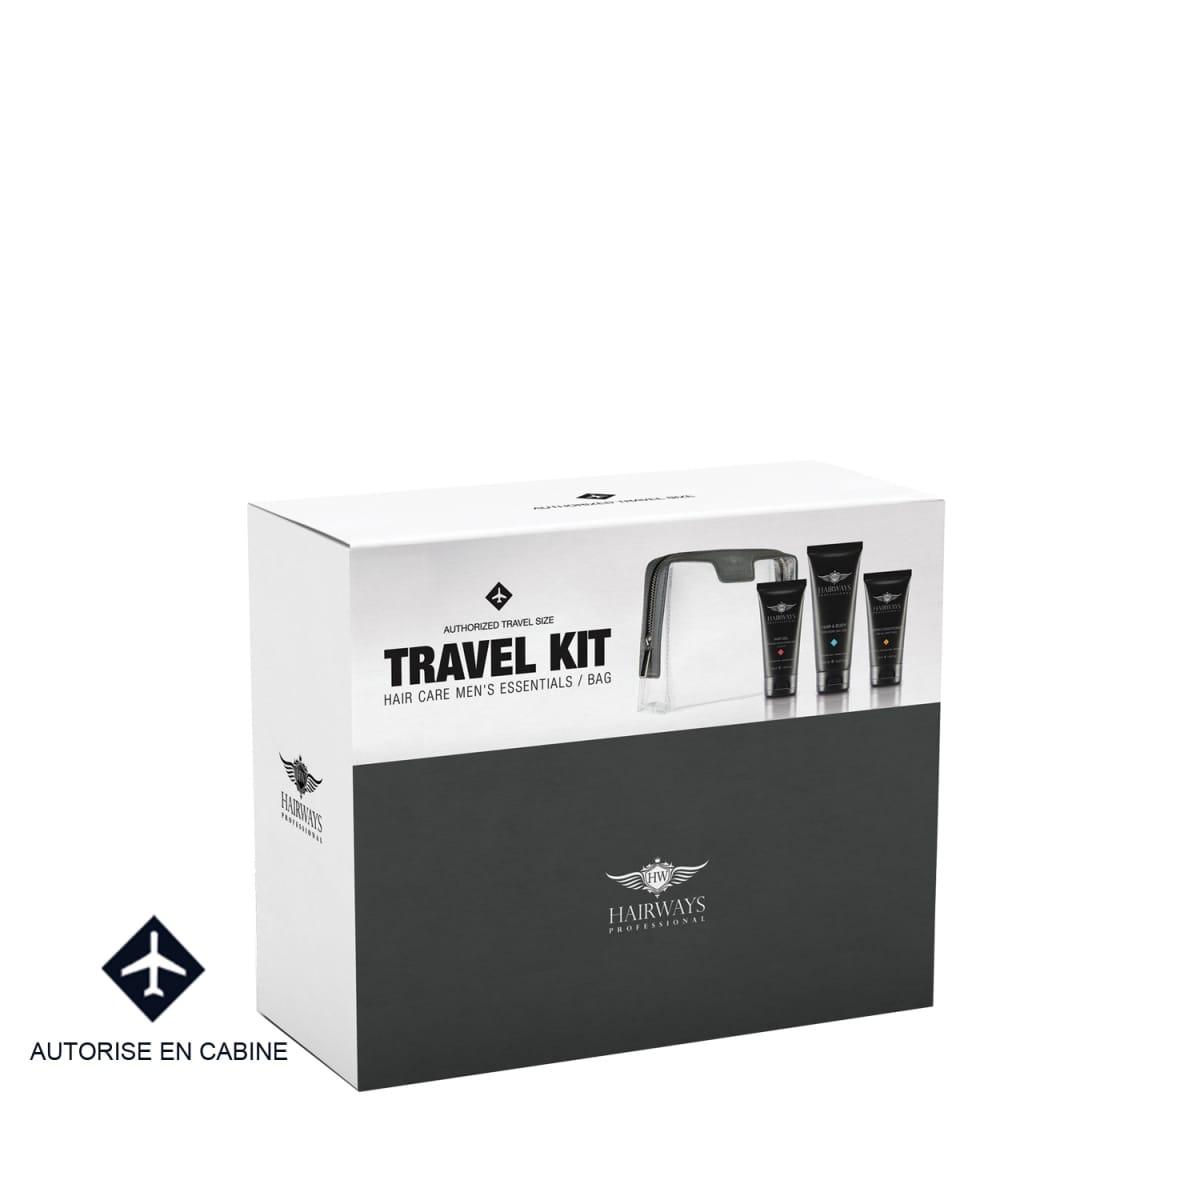 Hairways professional kit de voyage homme 3 produits incenza - Kit voyage homme ...